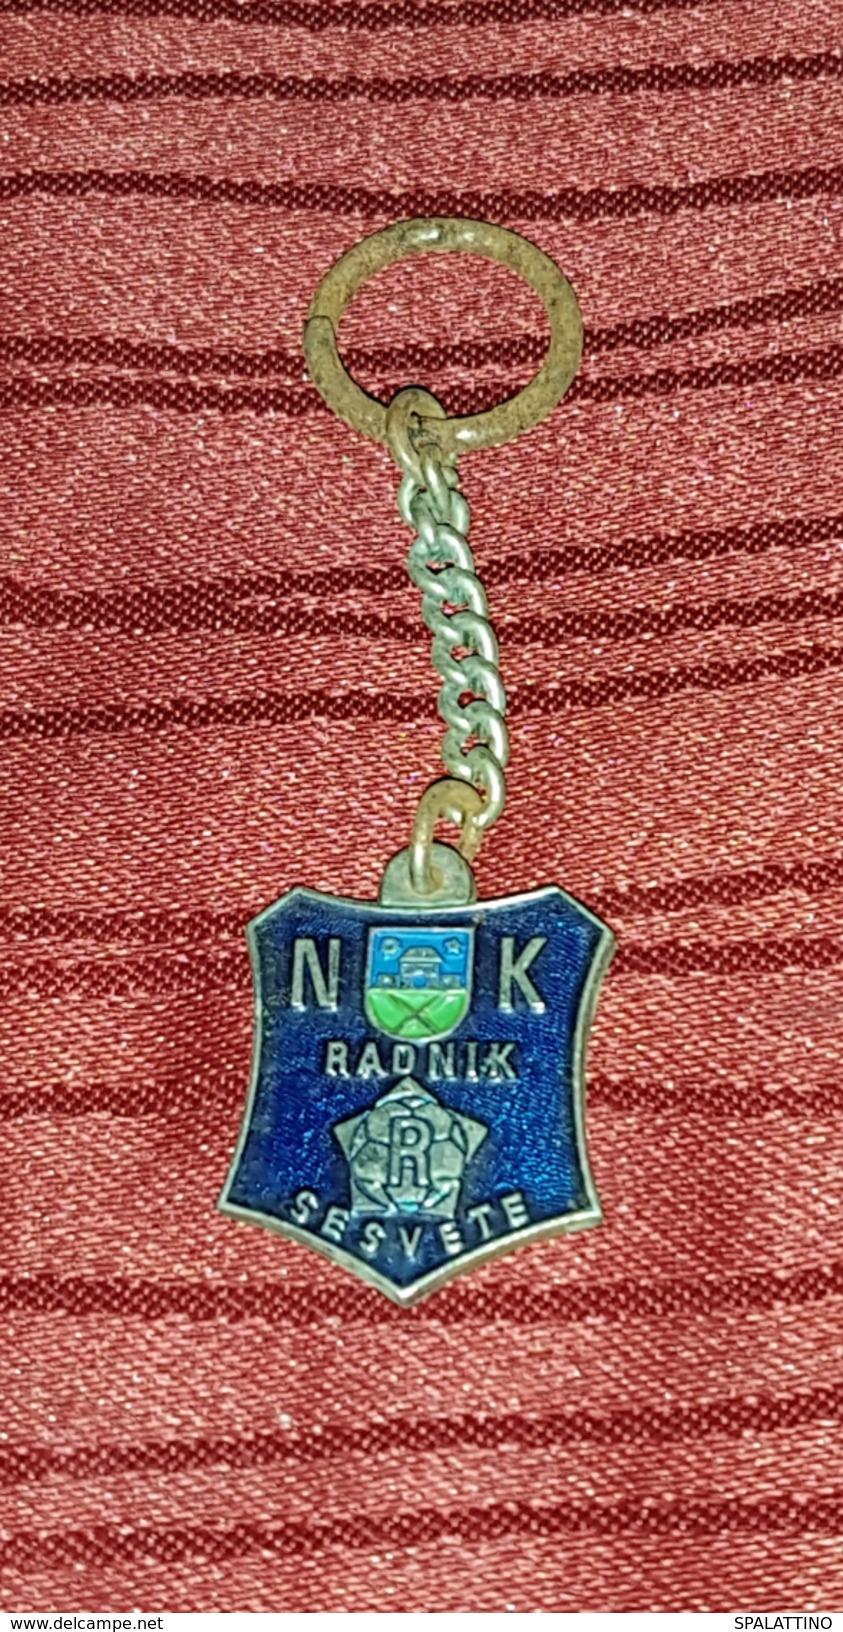 NK RADNIK SESVETE CROATIA VINTAGE KEY CHAIN - Fussball